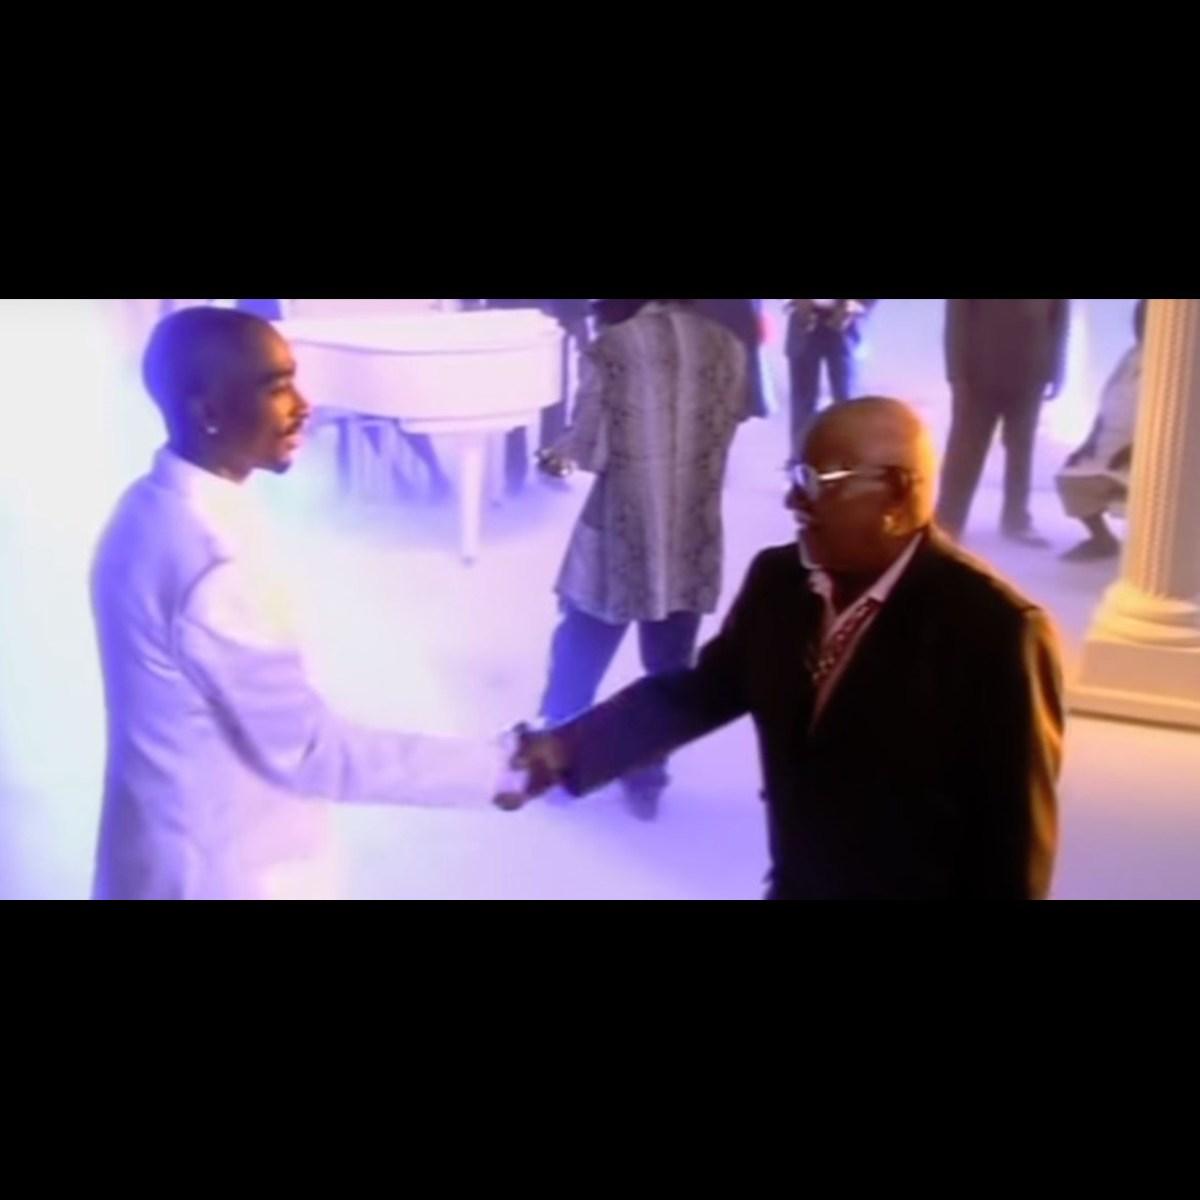 2Pac - I Ain't Mad At Cha (ft. Danny Boy) (Thumbnail)